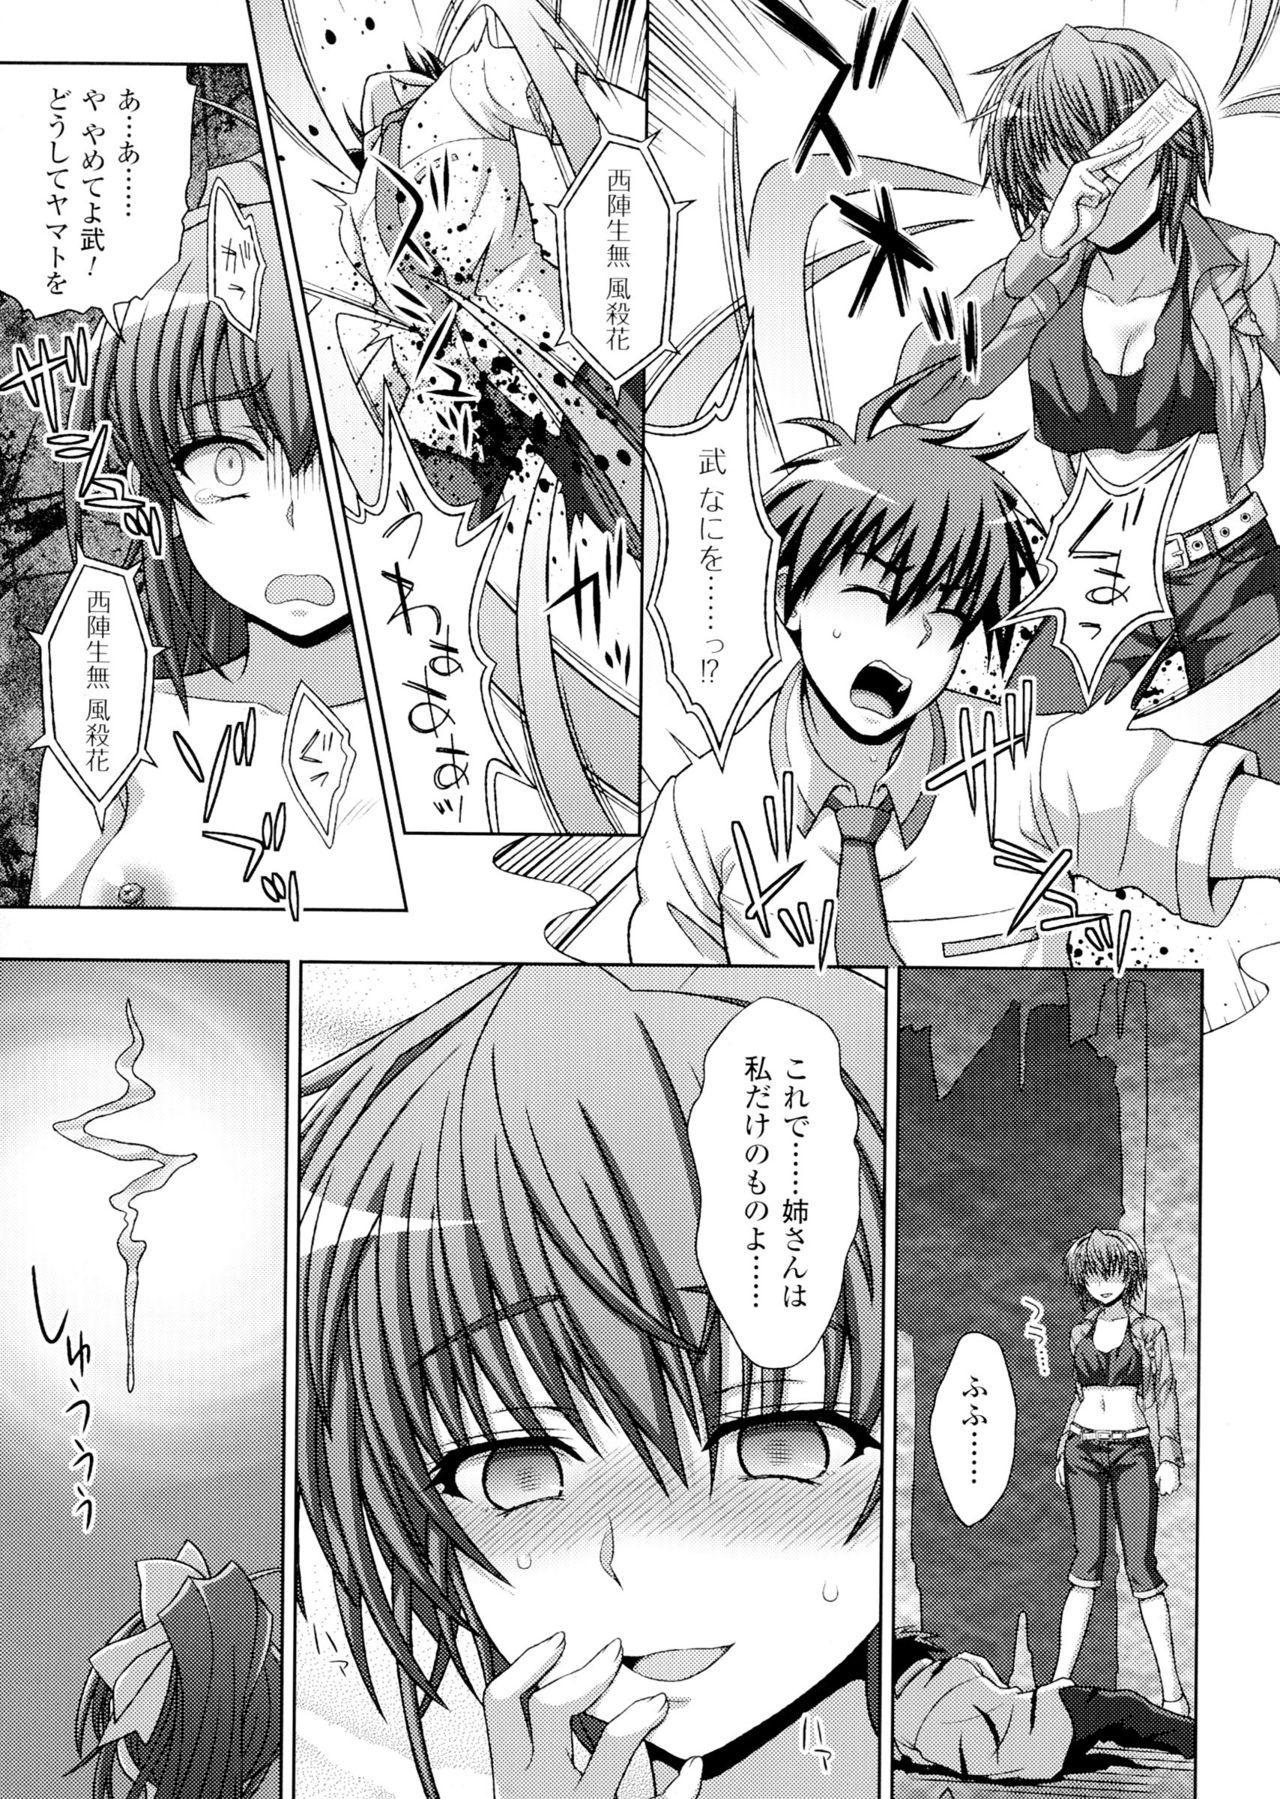 Seigi no Heroine Kangoku File DX Vol. 1 128